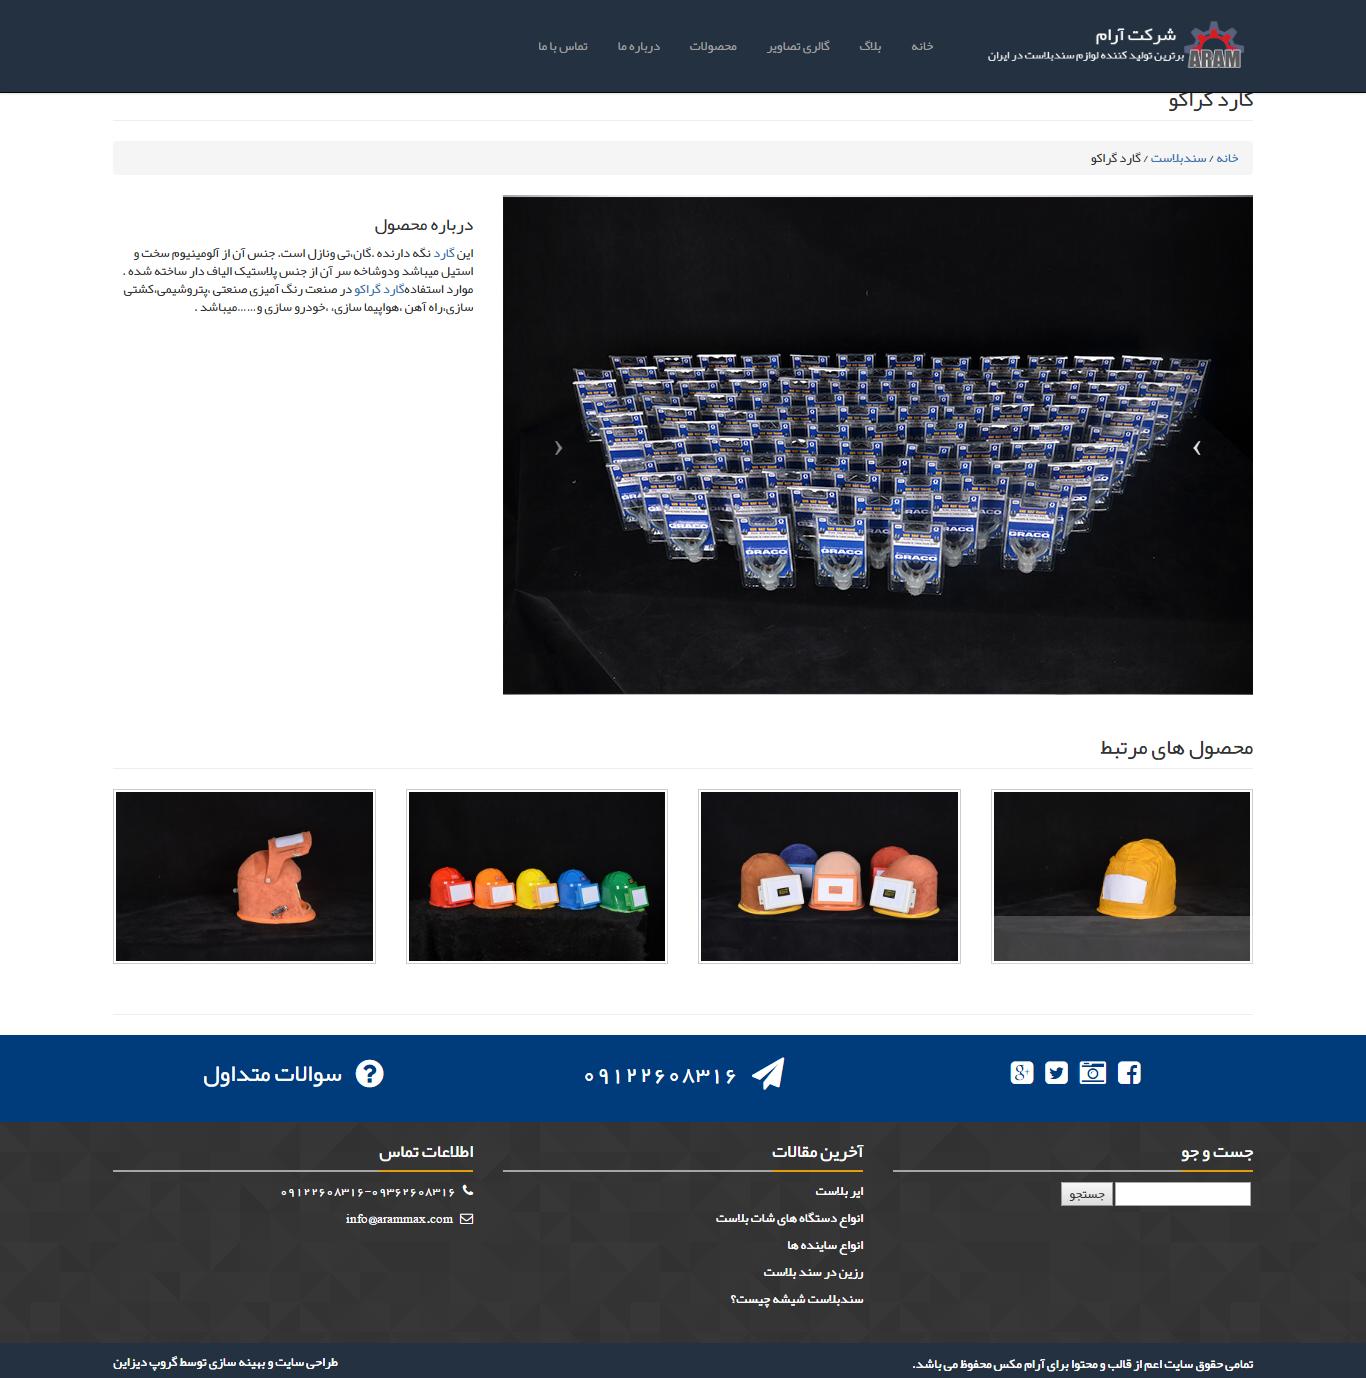 screencapture-arammax-portfolio-DA-AF-D8-A7-D8-B1-D8-AF-DA-AF-D8-B1-D8-A7-DA-A9-D9-88-1476394819149 طراحی سایت شرکتی آرام مکس